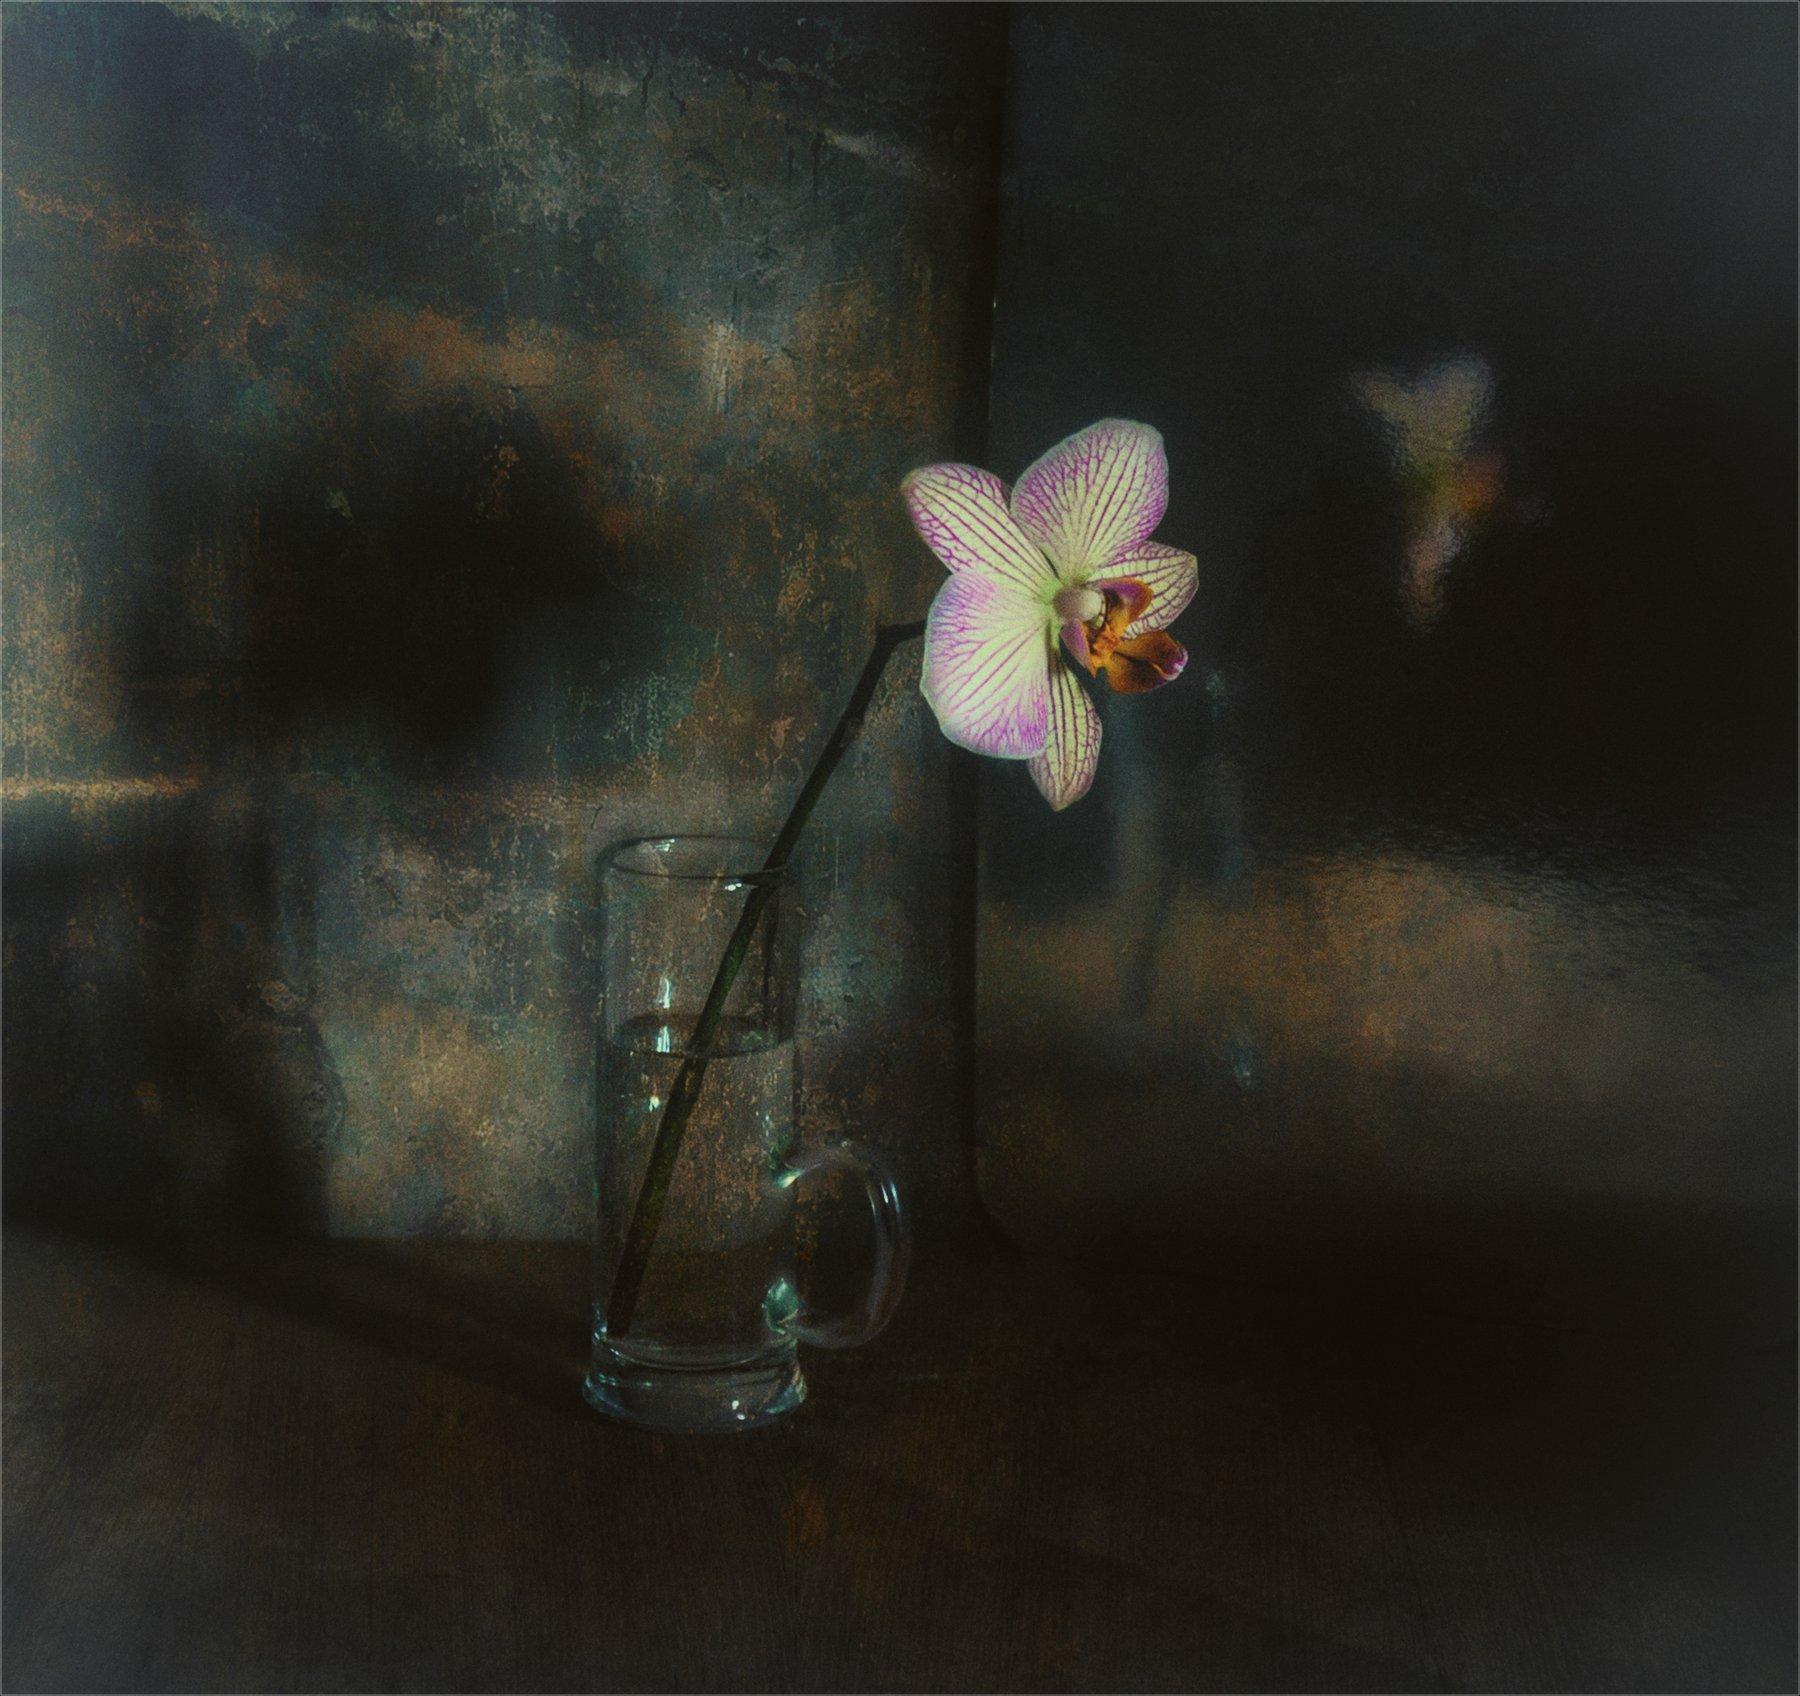 still life, натюрморт,  цветы, природа, орхидея,  винтаж, минимализм, Михаил MSH